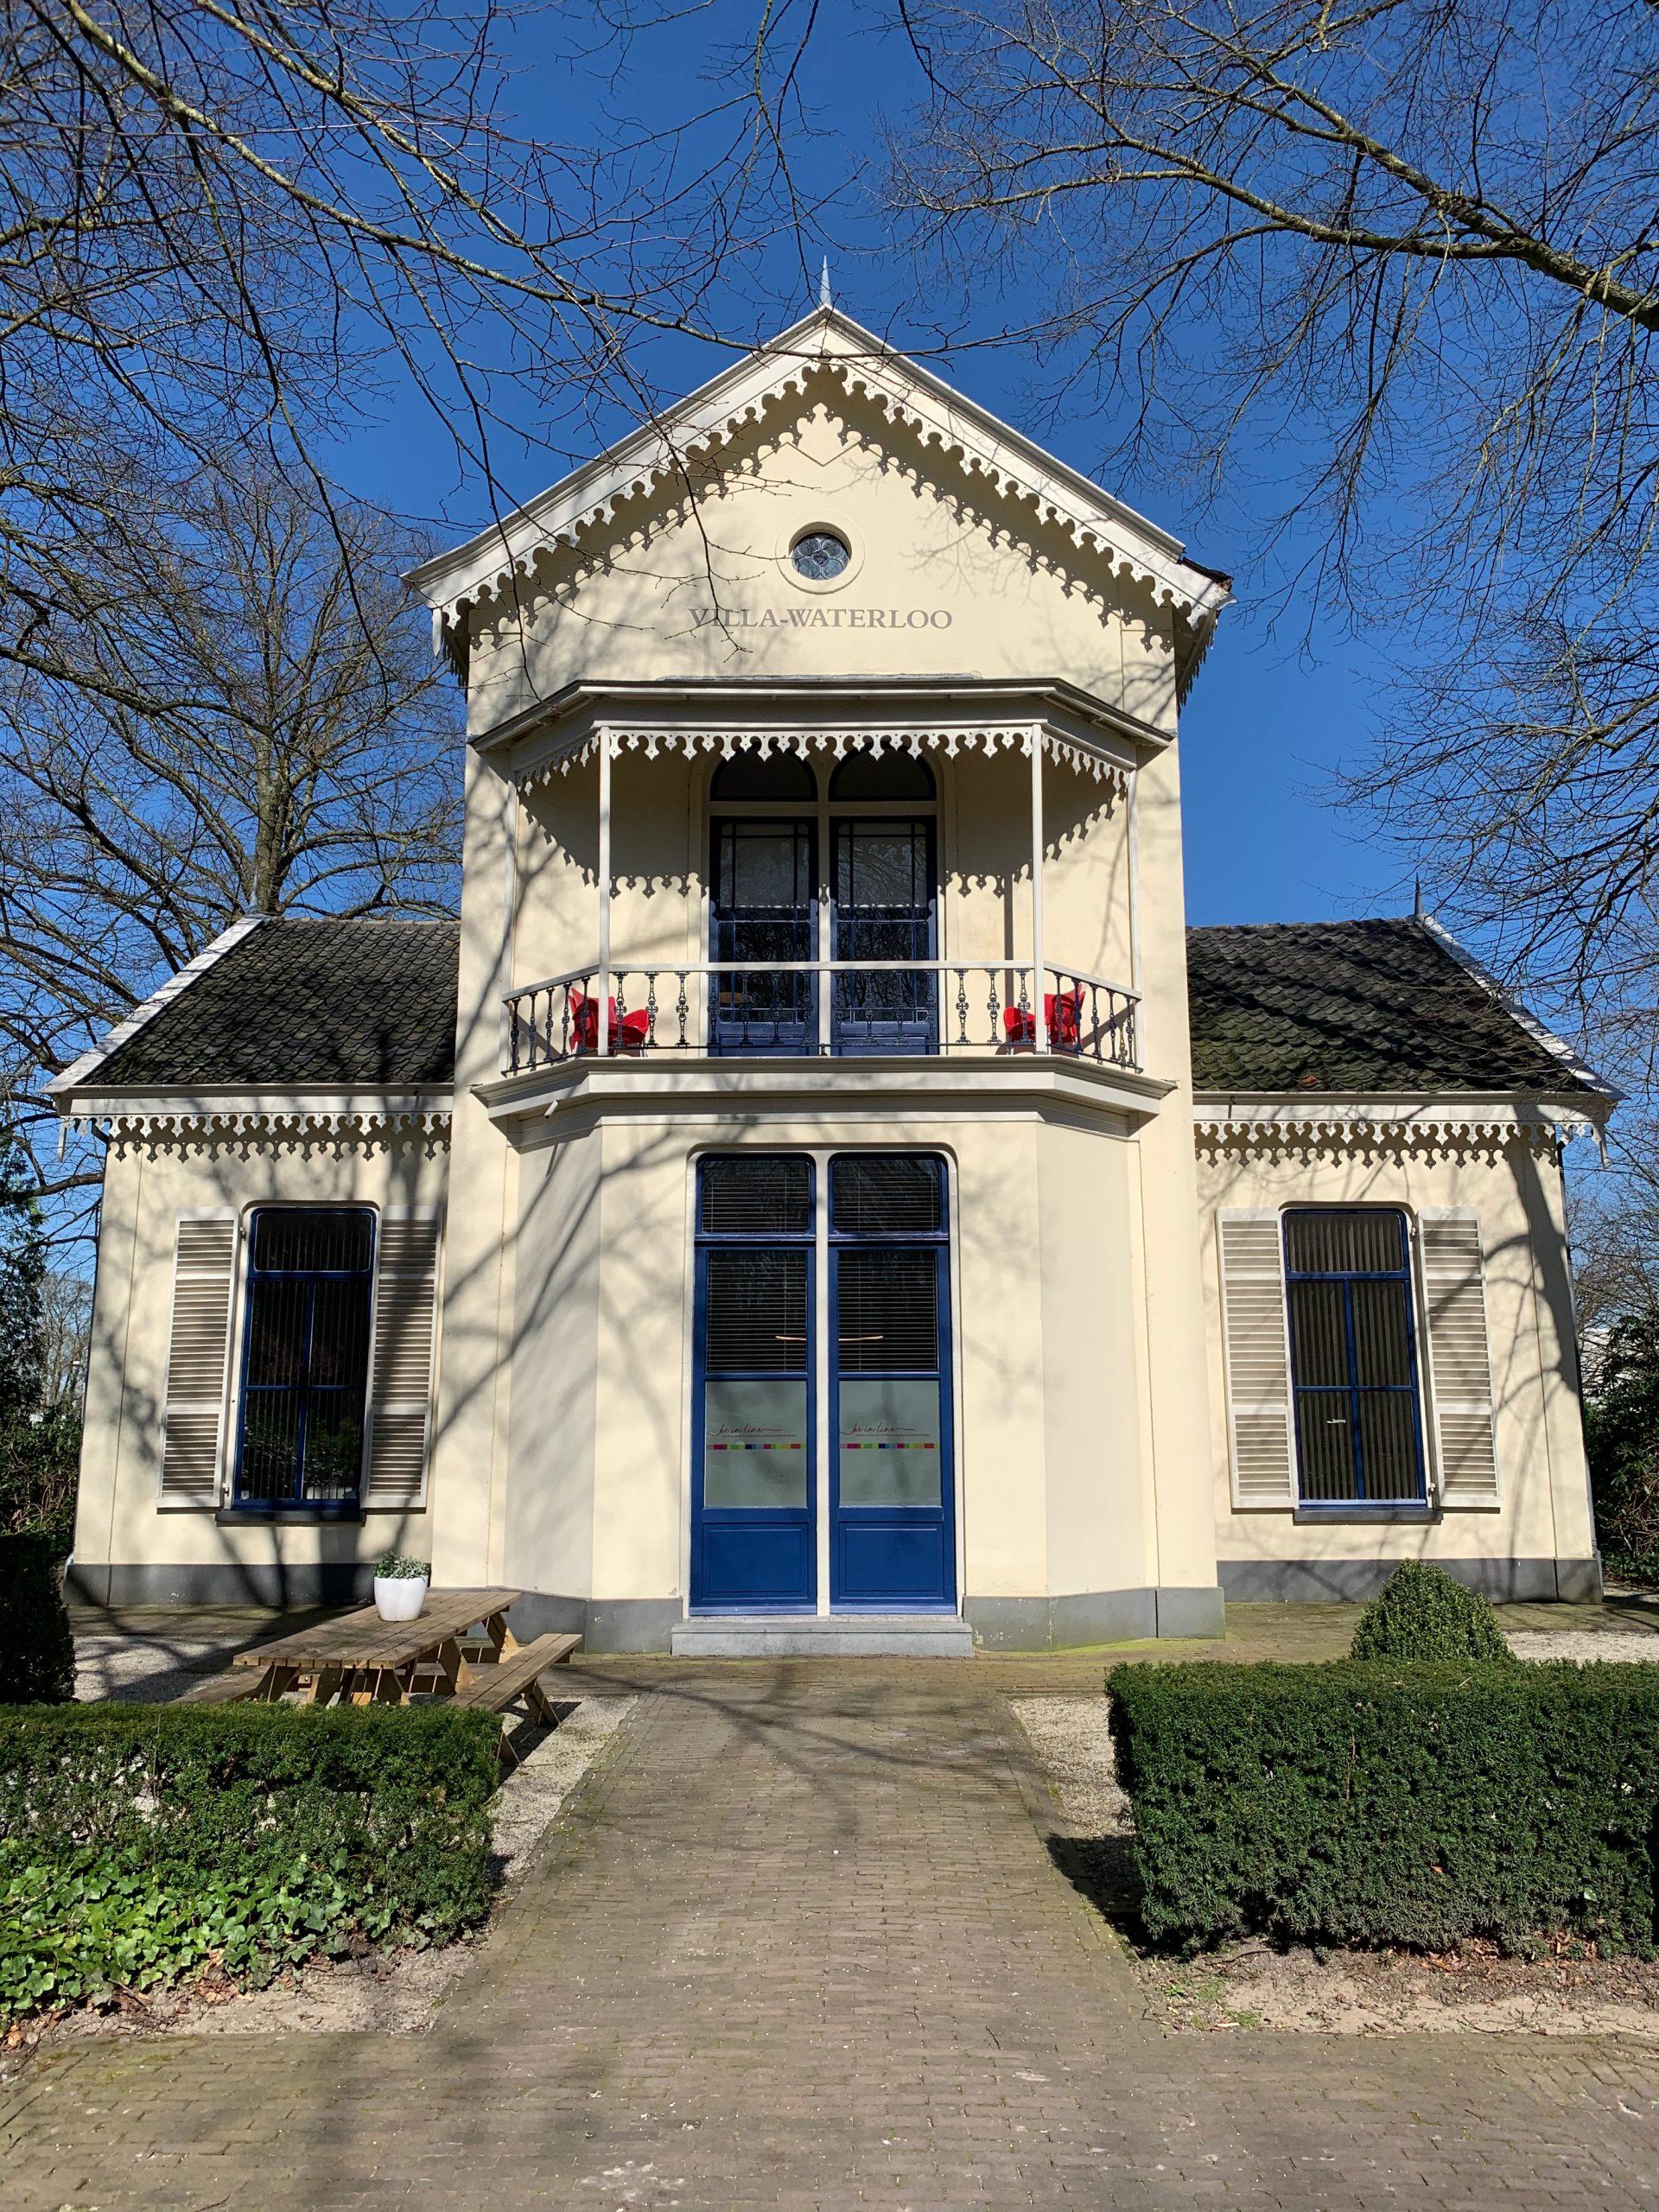 villa Waterloo